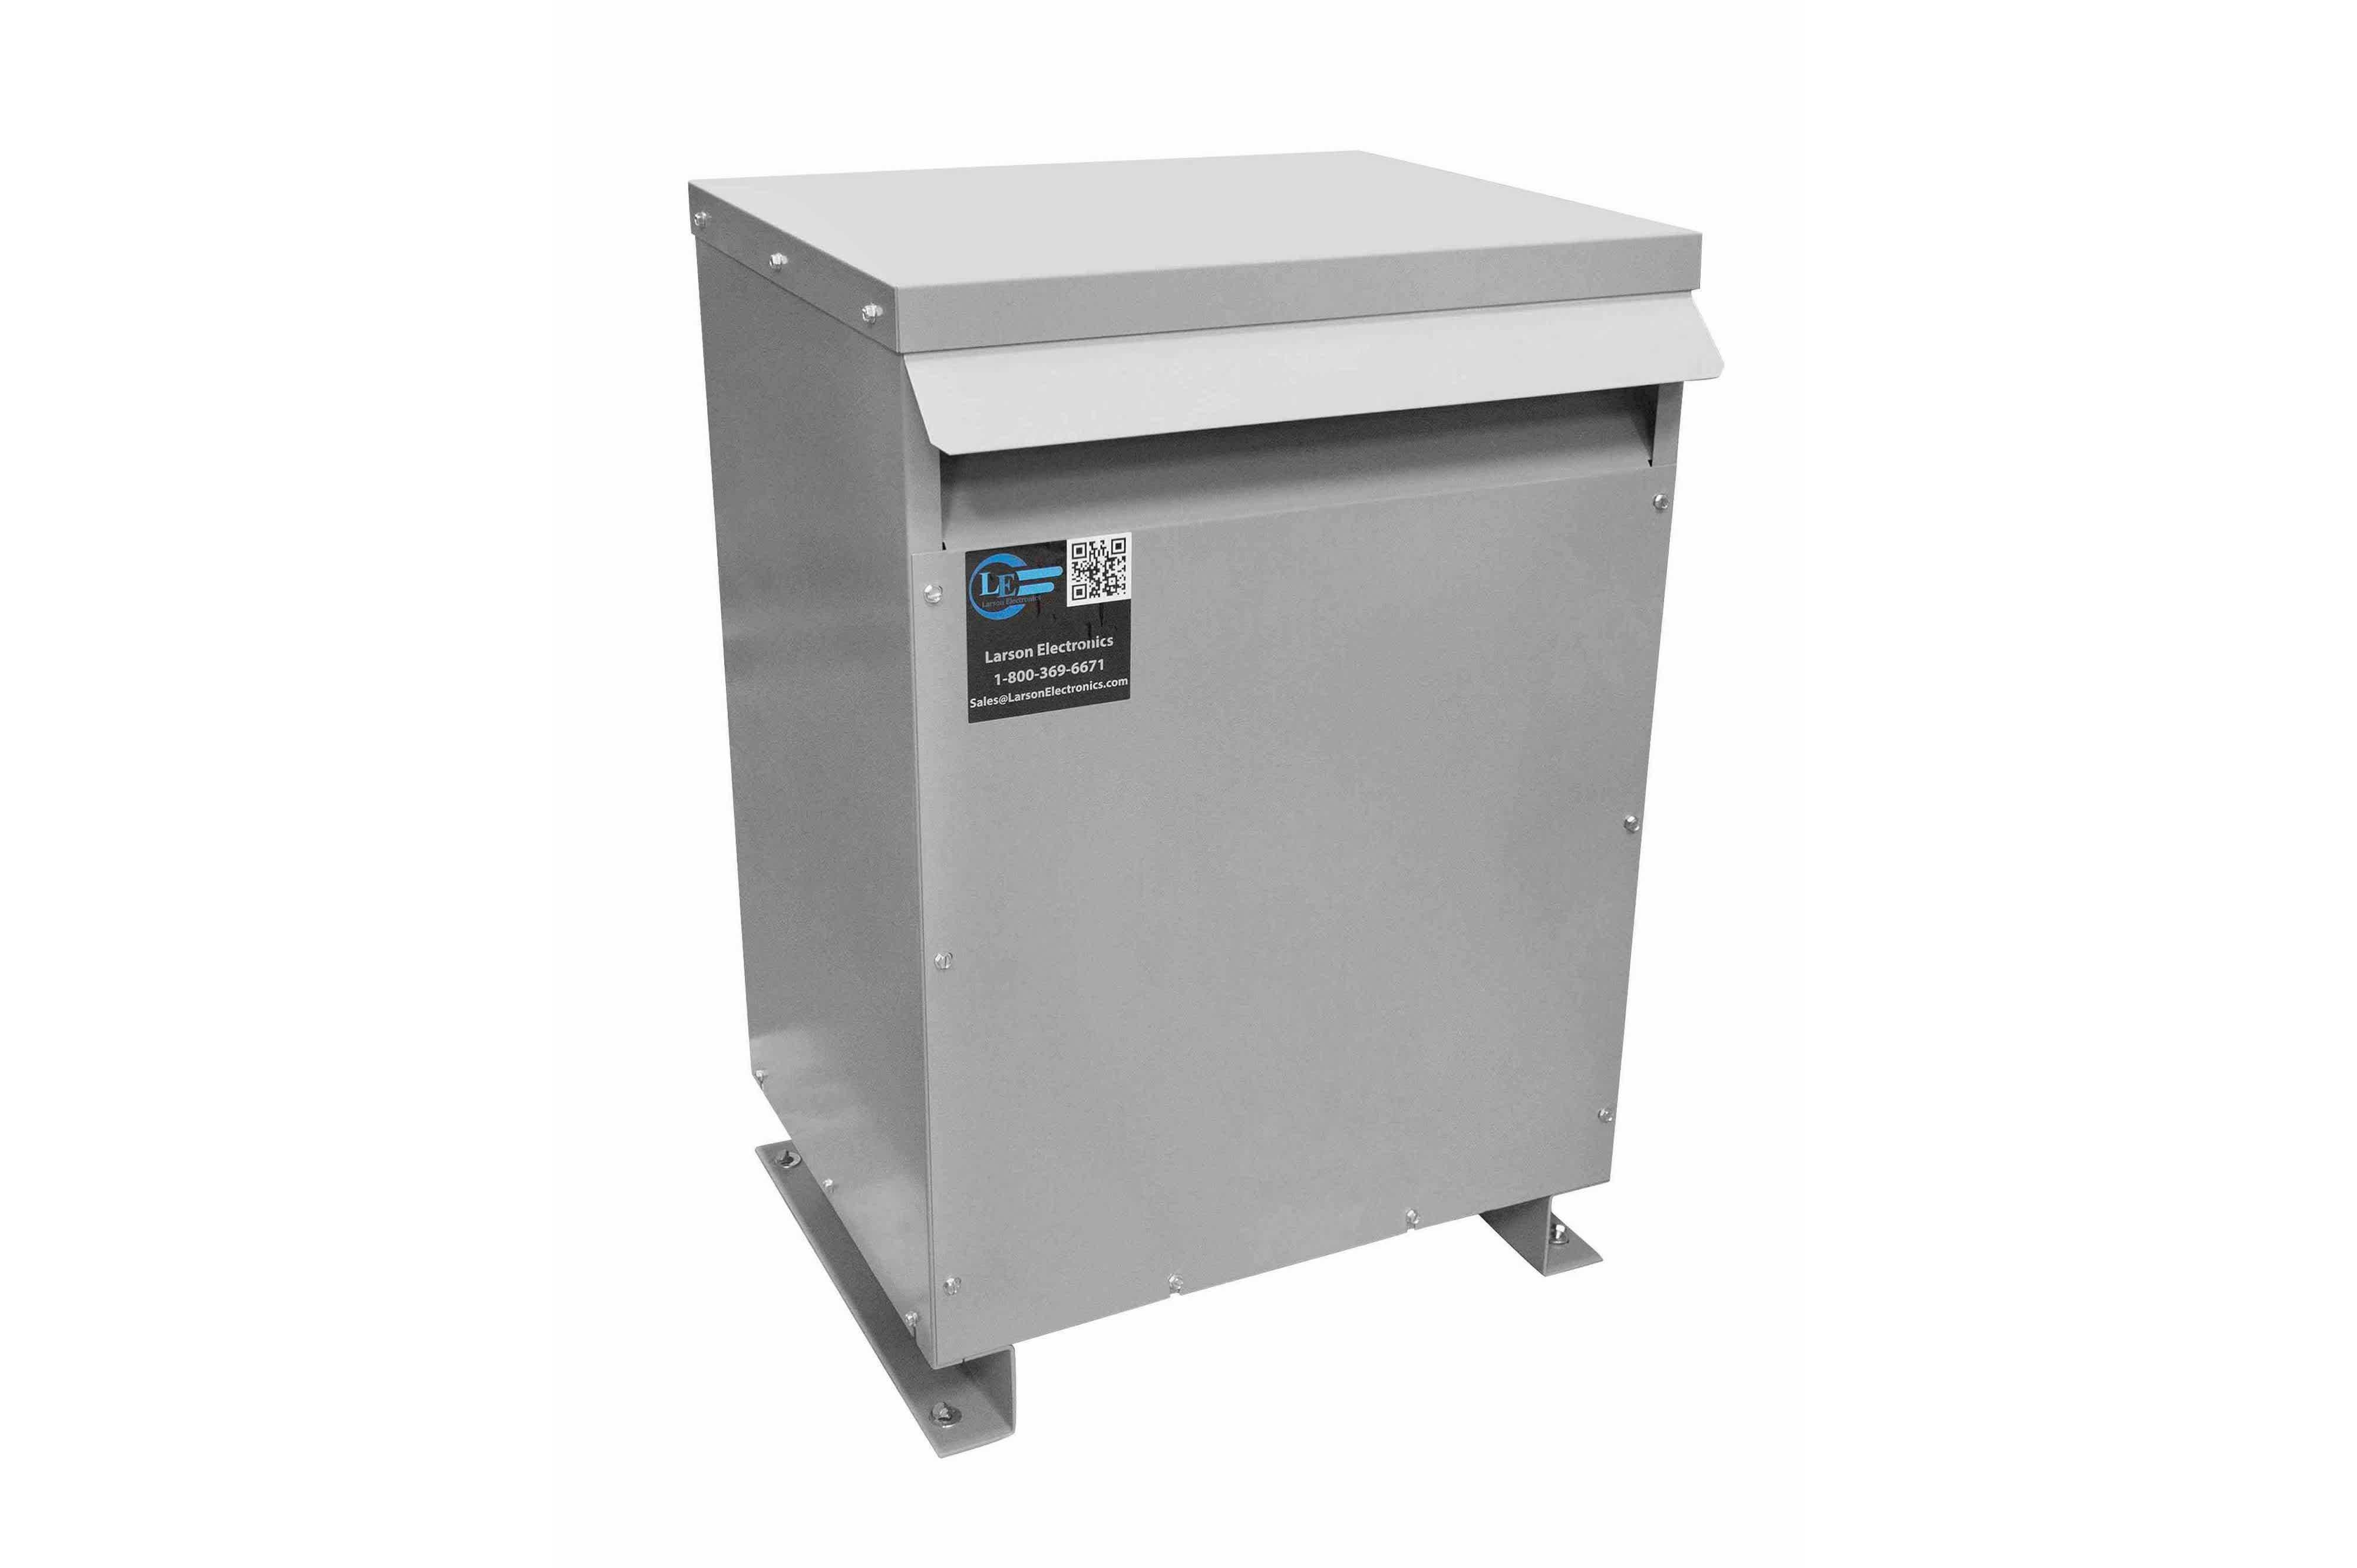 175 kVA 3PH Isolation Transformer, 480V Wye Primary, 415V Delta Secondary, N3R, Ventilated, 60 Hz